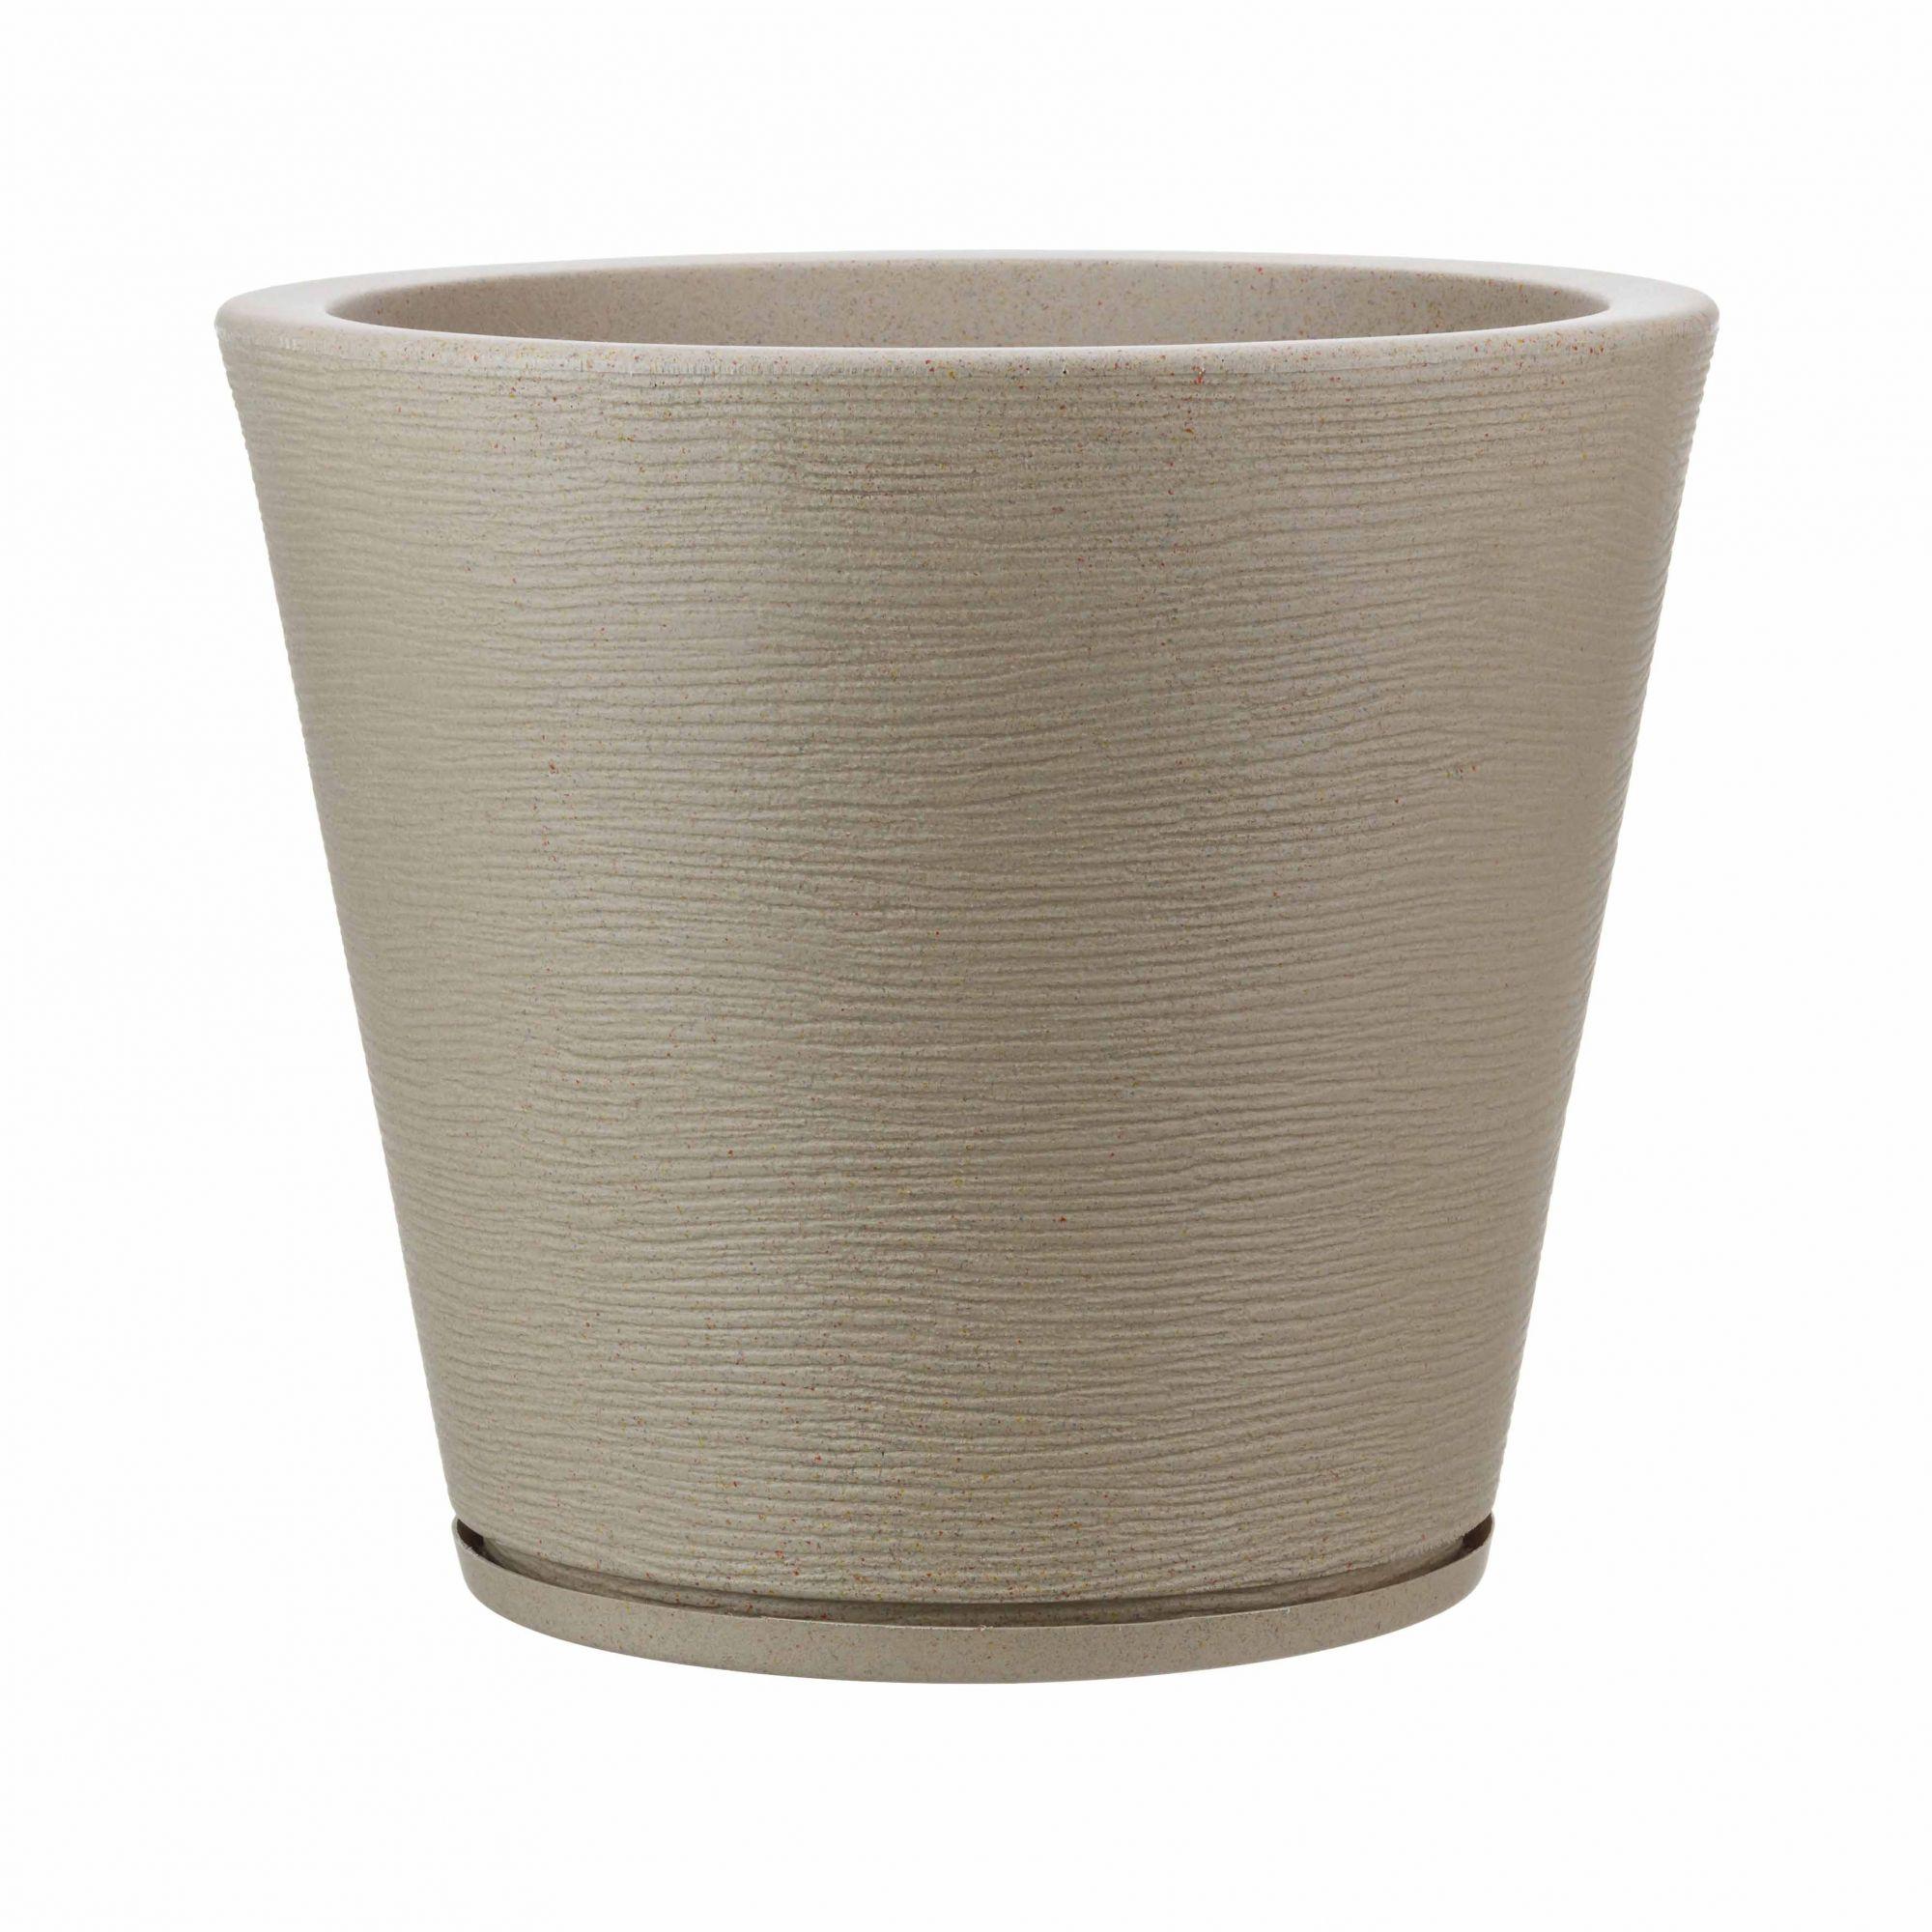 Vaso Genebra Grafiato Bege Stone - 34 x 35 cm